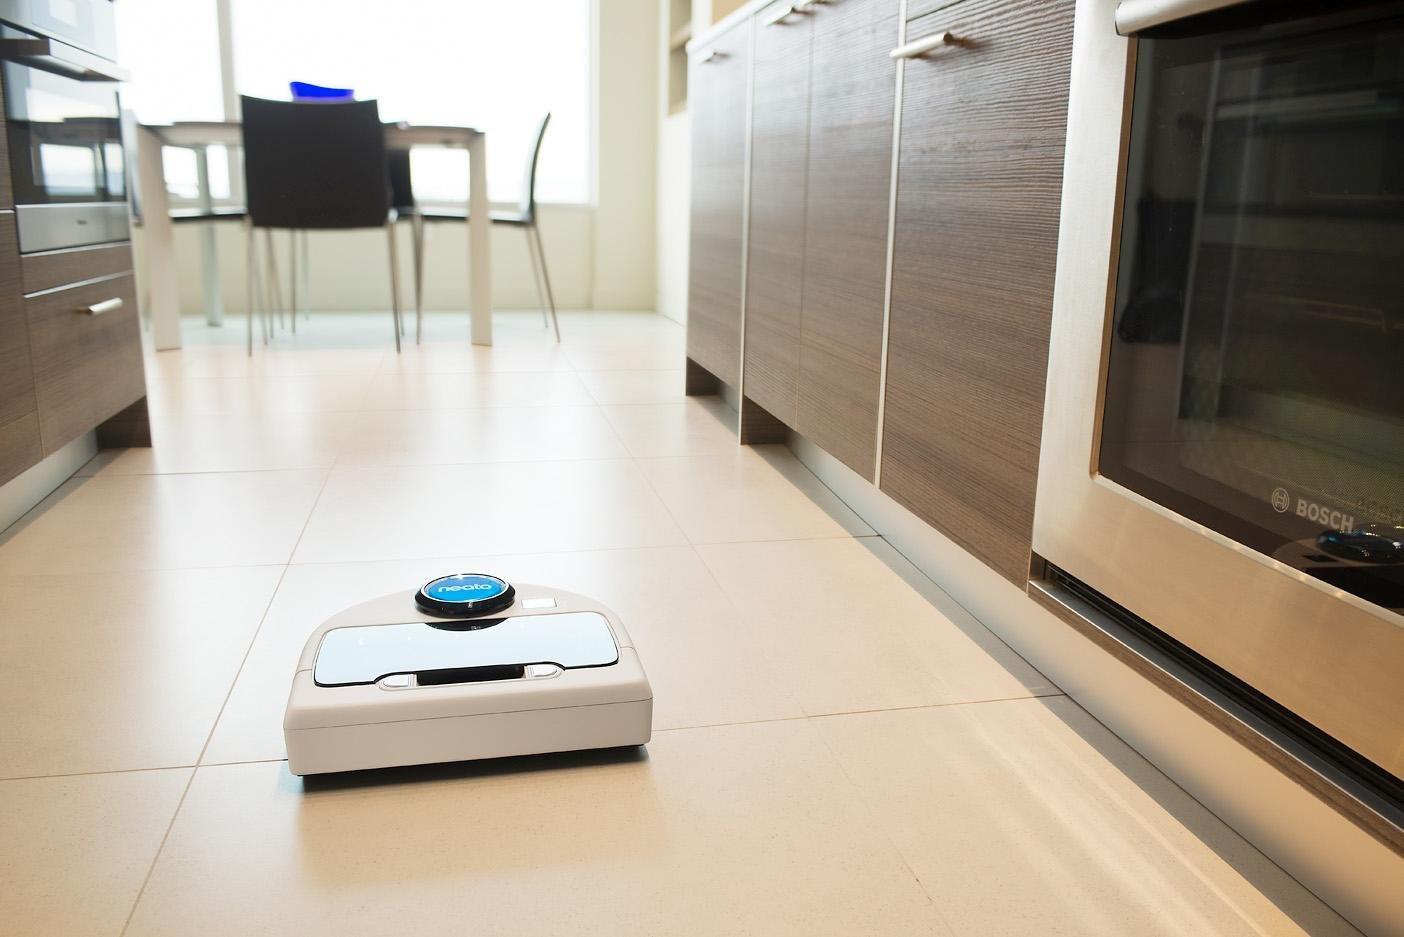 hardwood floor vacuum ratings of vacuum and floor care shop amazon uk with special floorcare